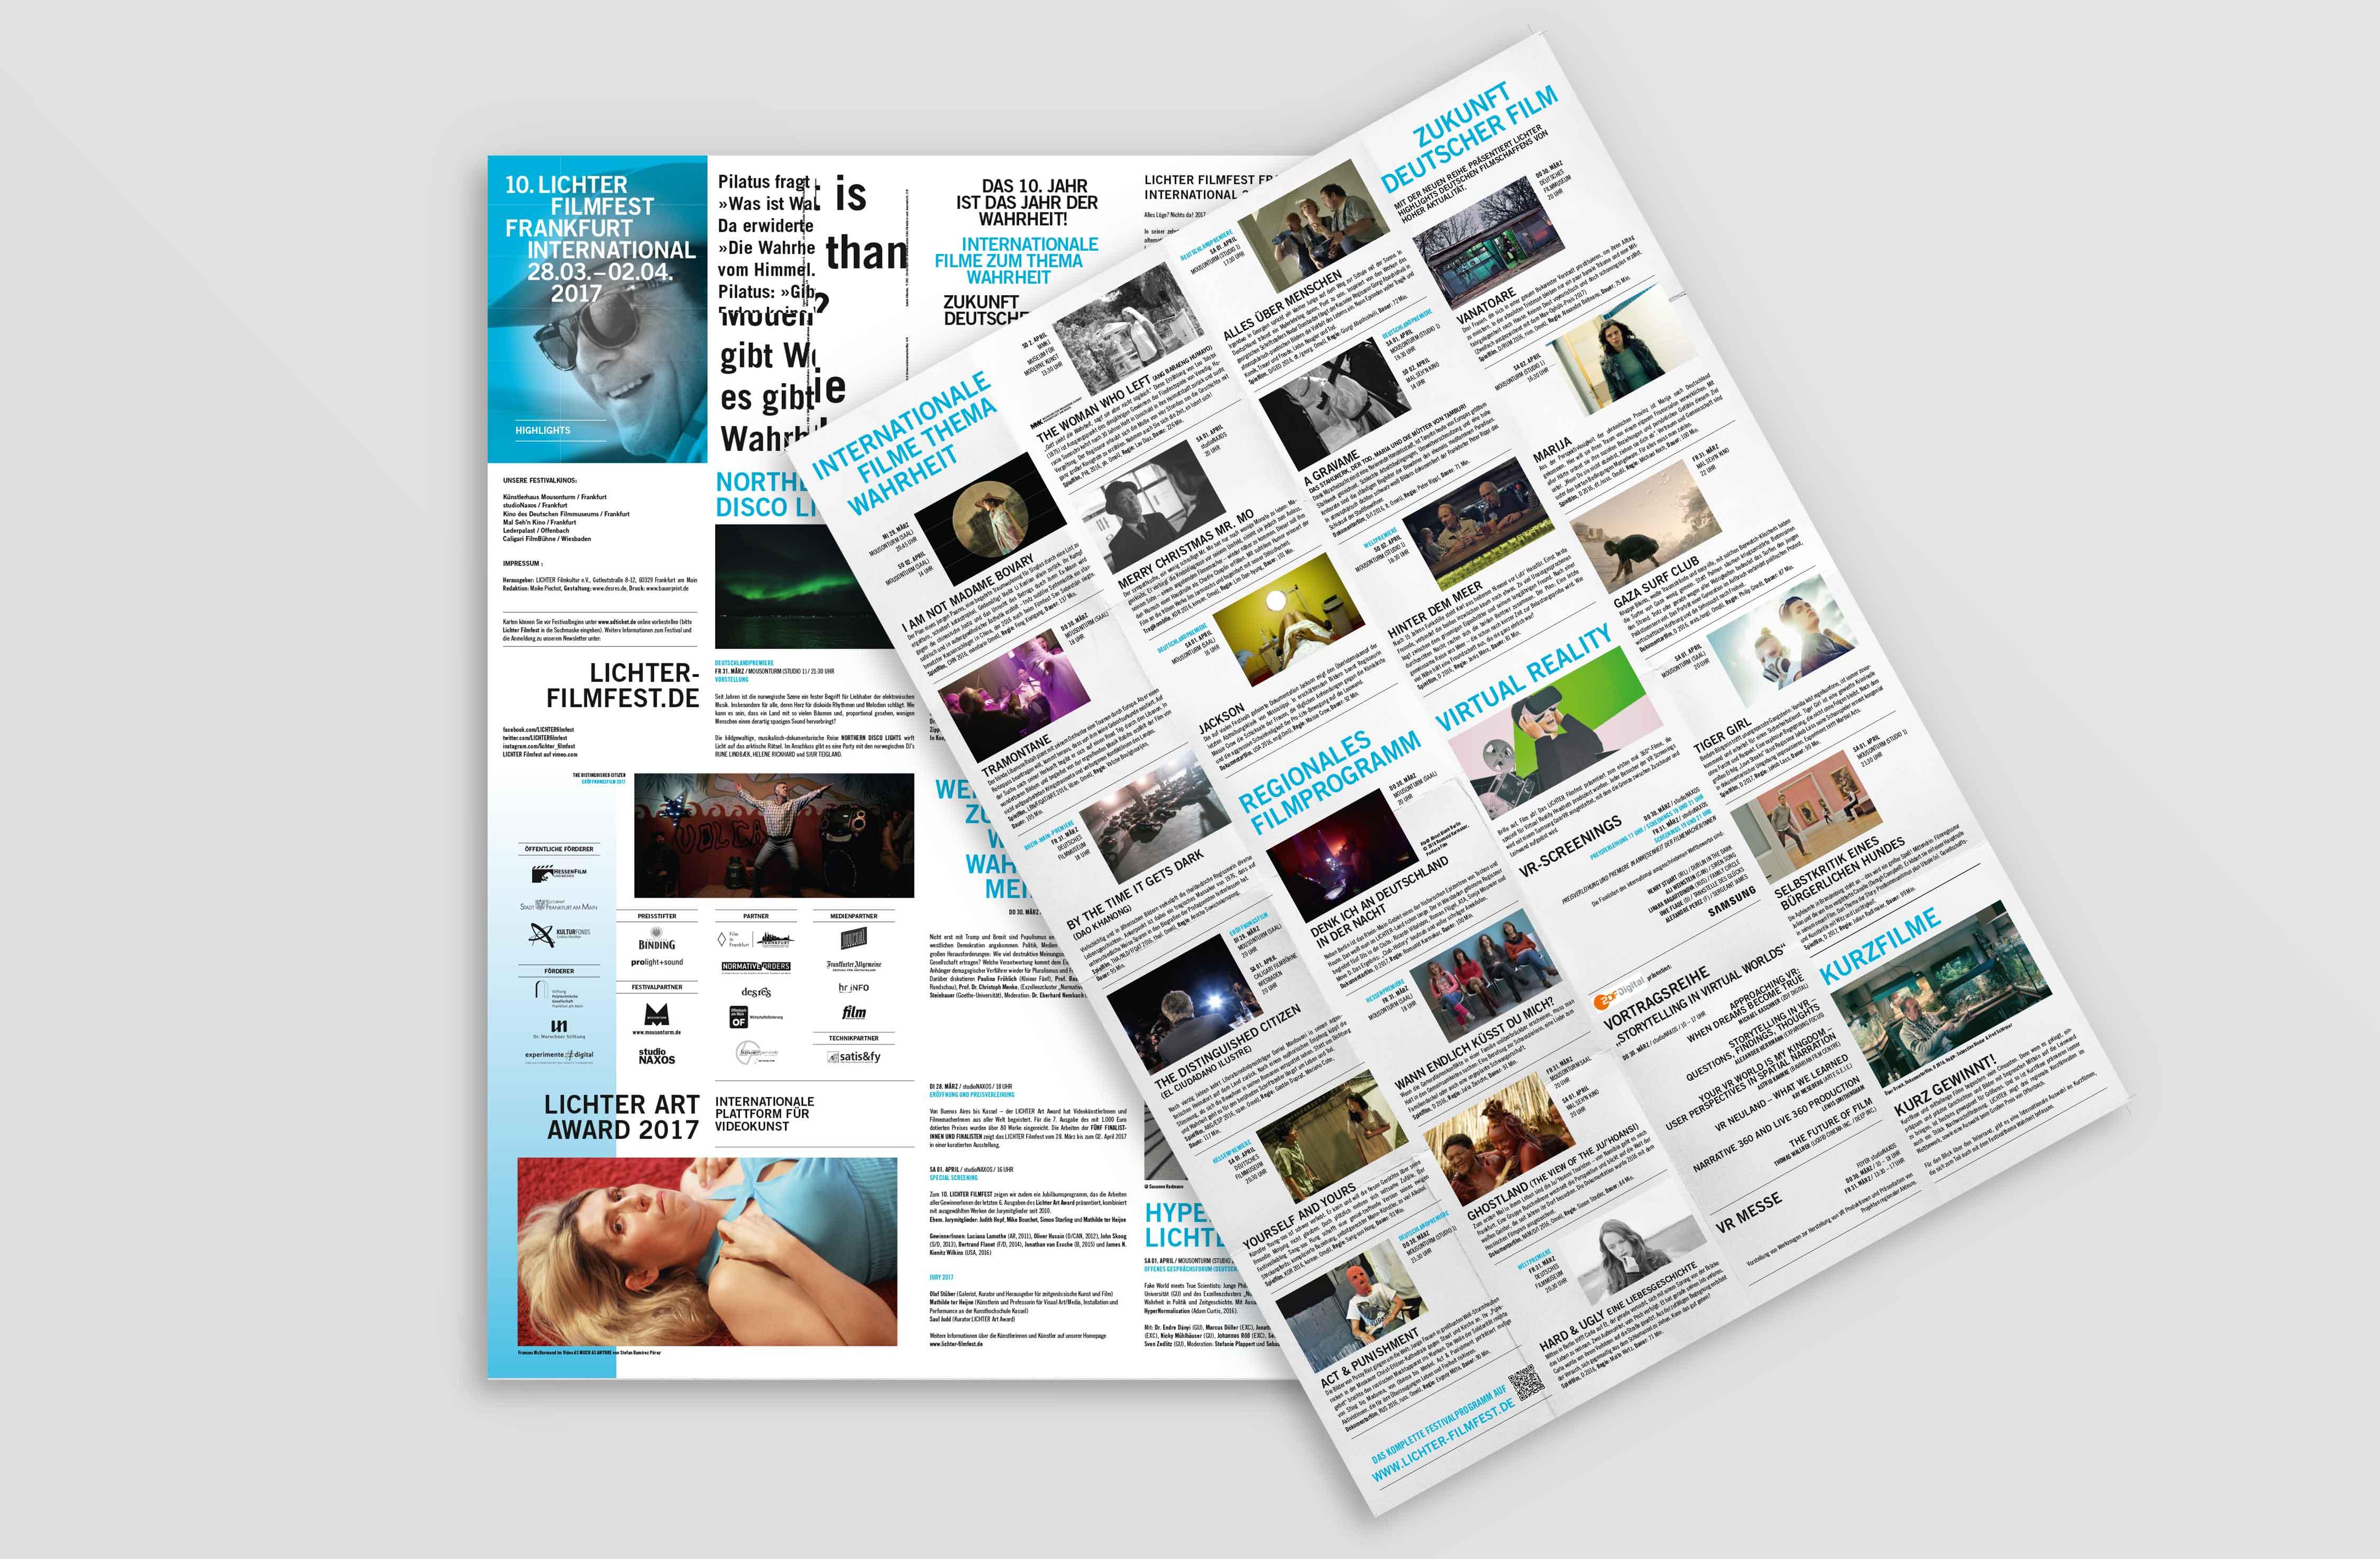 LICHTER_2017_Folded_Paper